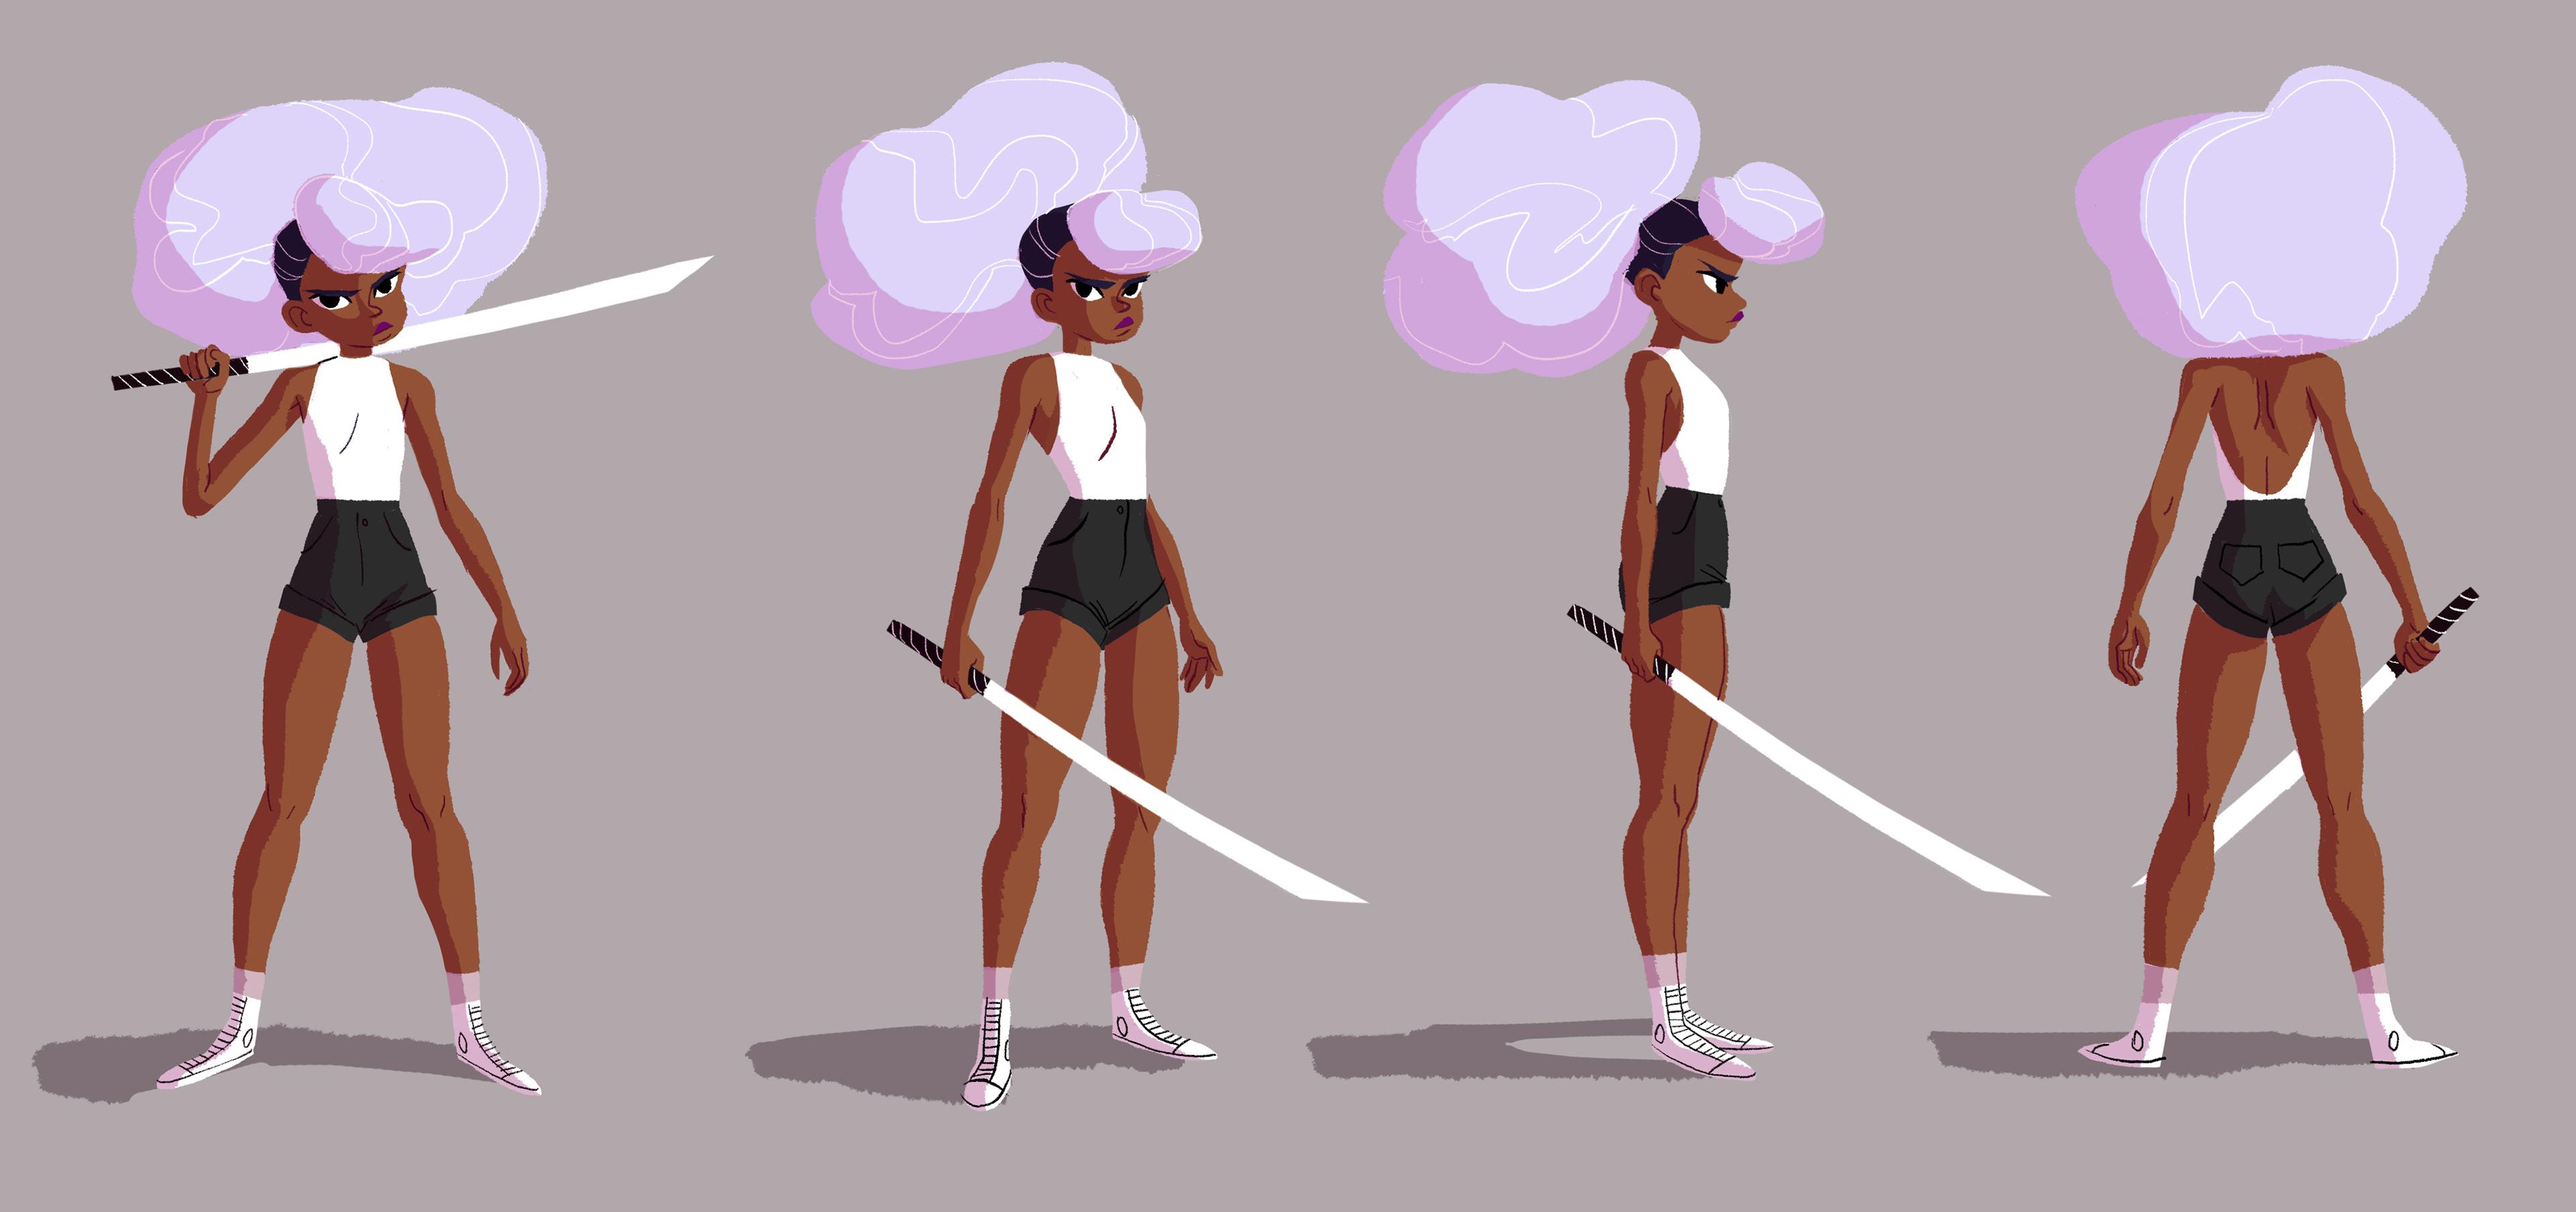 marika cowan character design